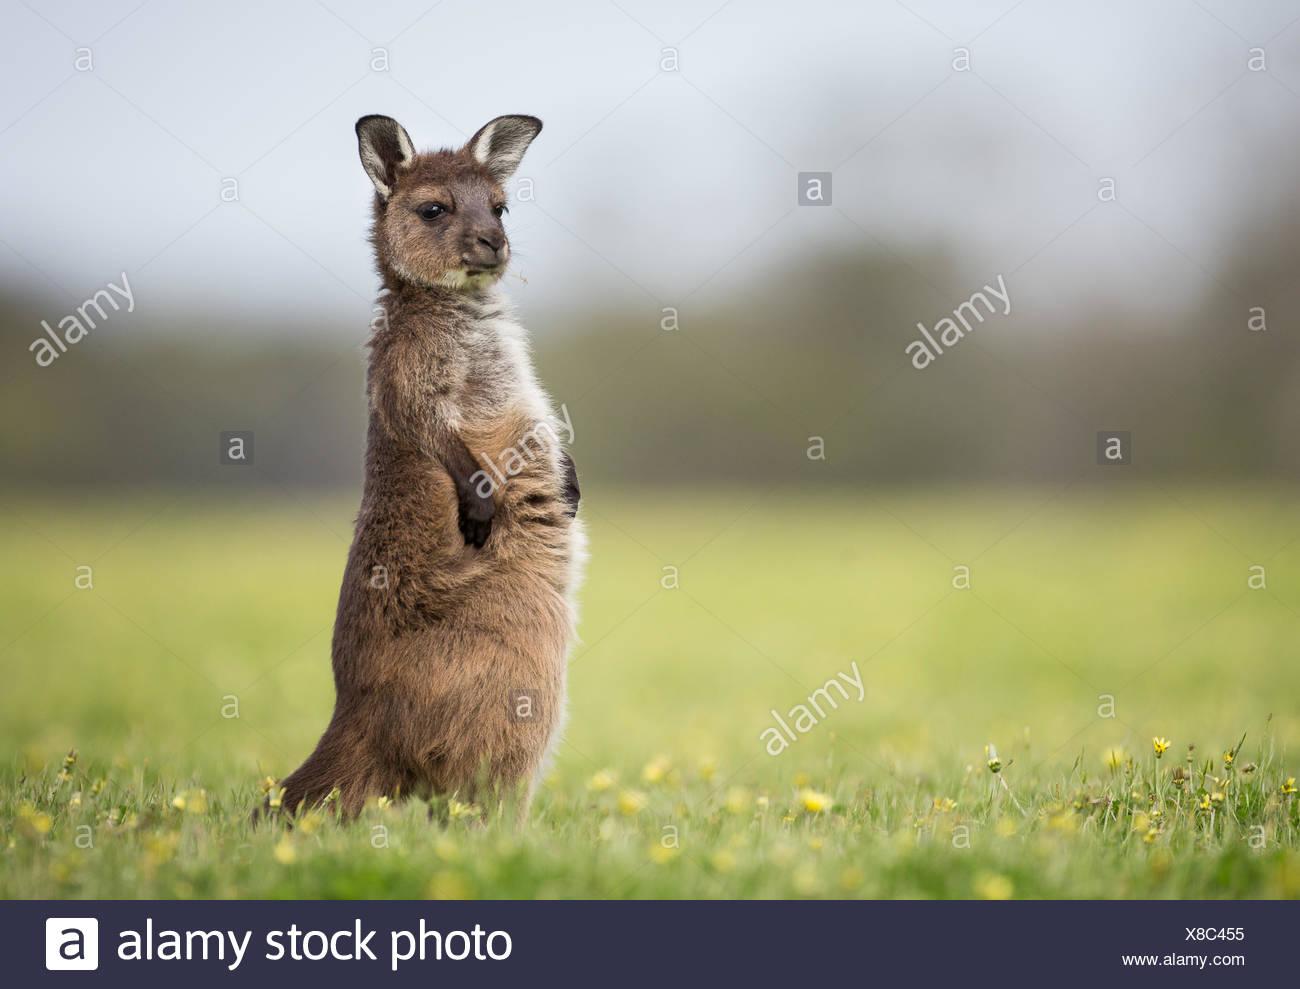 Un kangourou gris de l'ouest de Joey, Macropus fuliginosus, debout dans l'herbe. Photo Stock